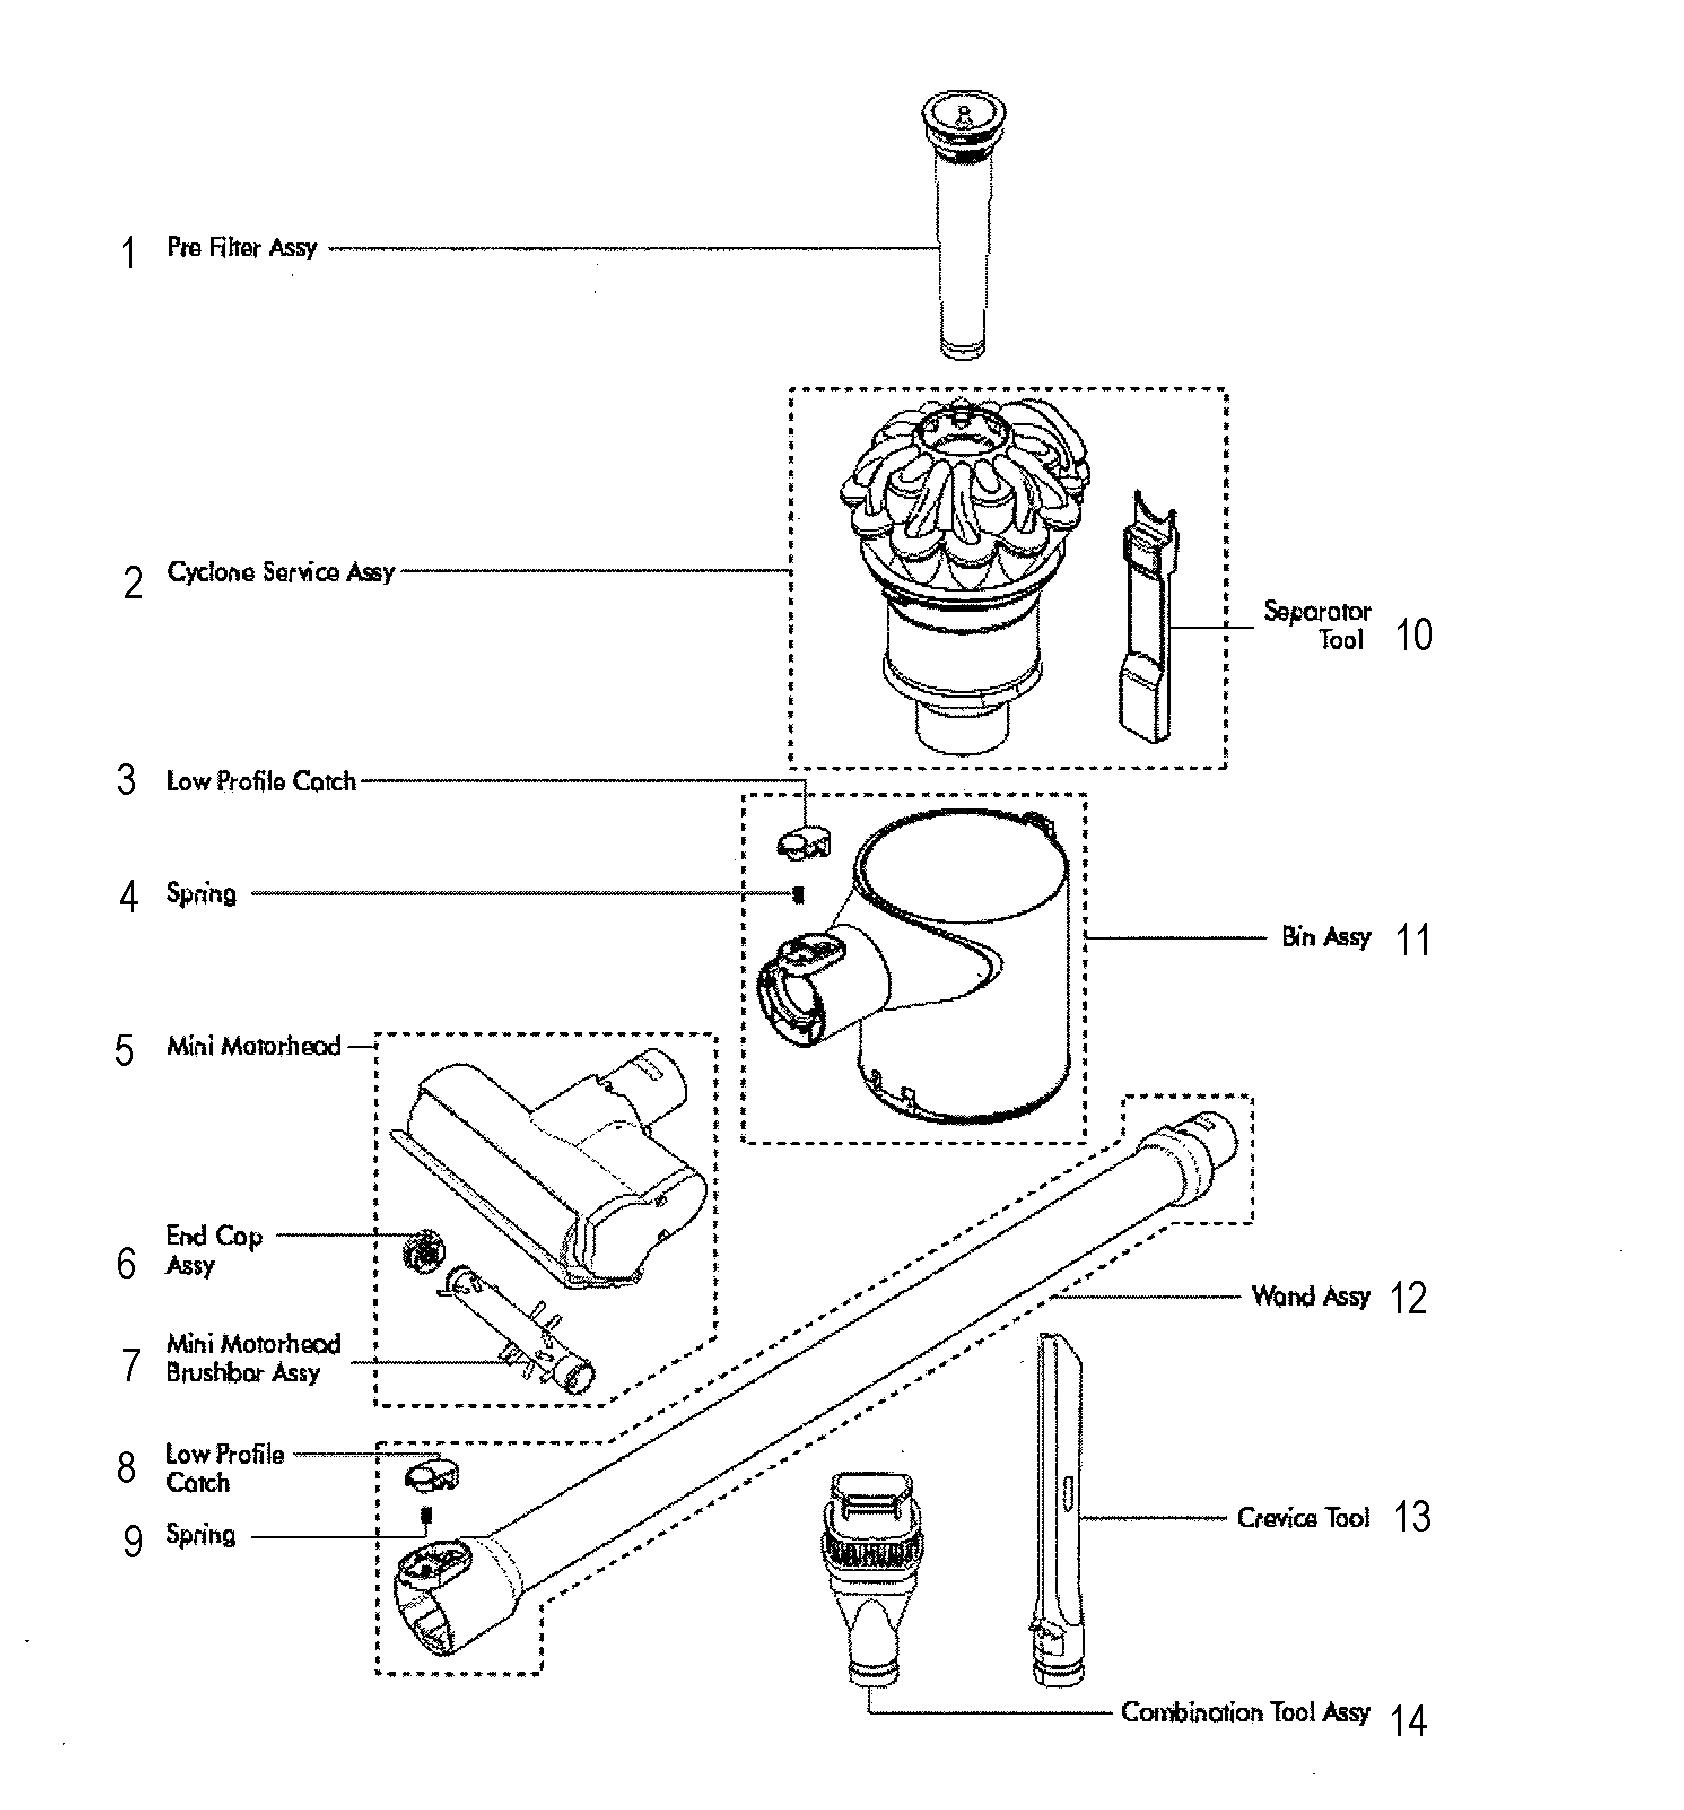 Dyson model V6-SV03 vacuum, hand-held genuine parts